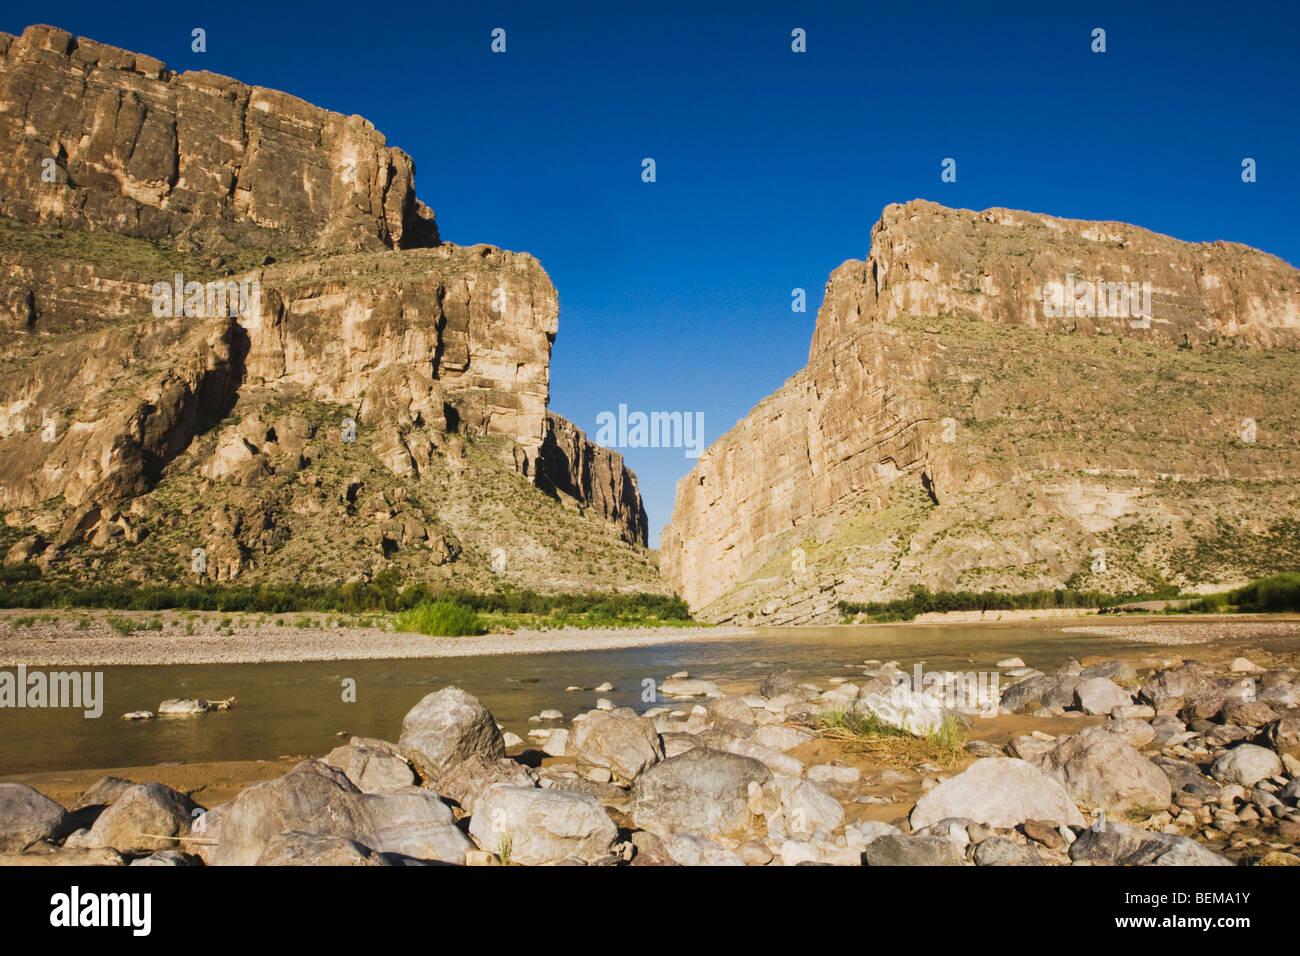 Santa Elena Canyon, Chisos Mountains, Big Bend National Park, Chihuahuan Desert, West Texas, USA - Stock Image